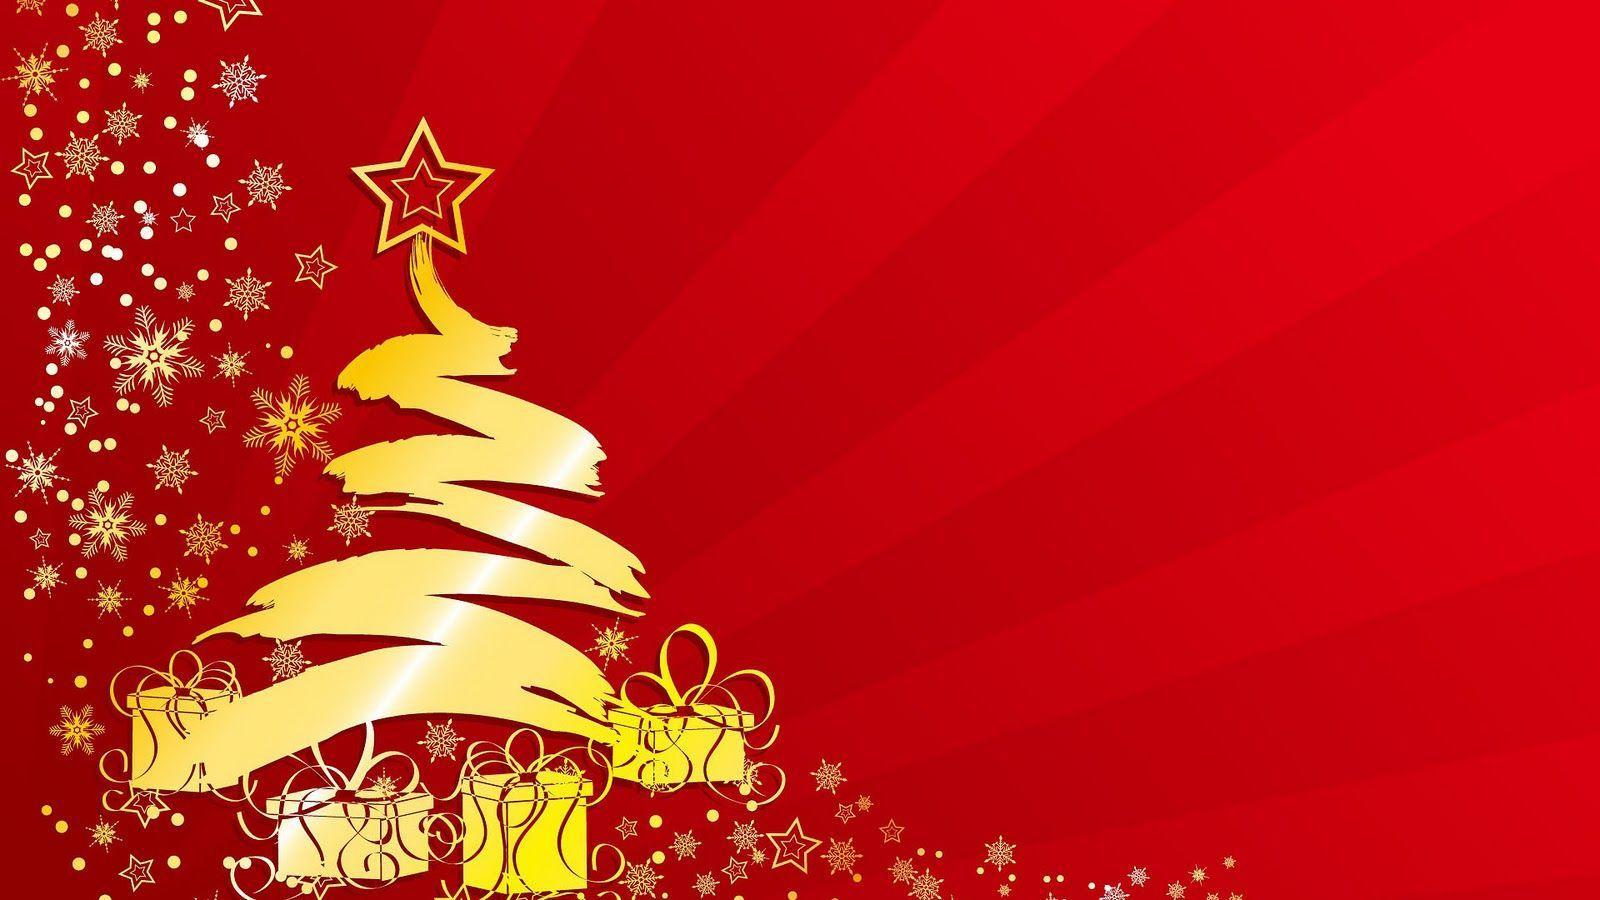 Christian Christmas Desktop Wallpapers 1600x900